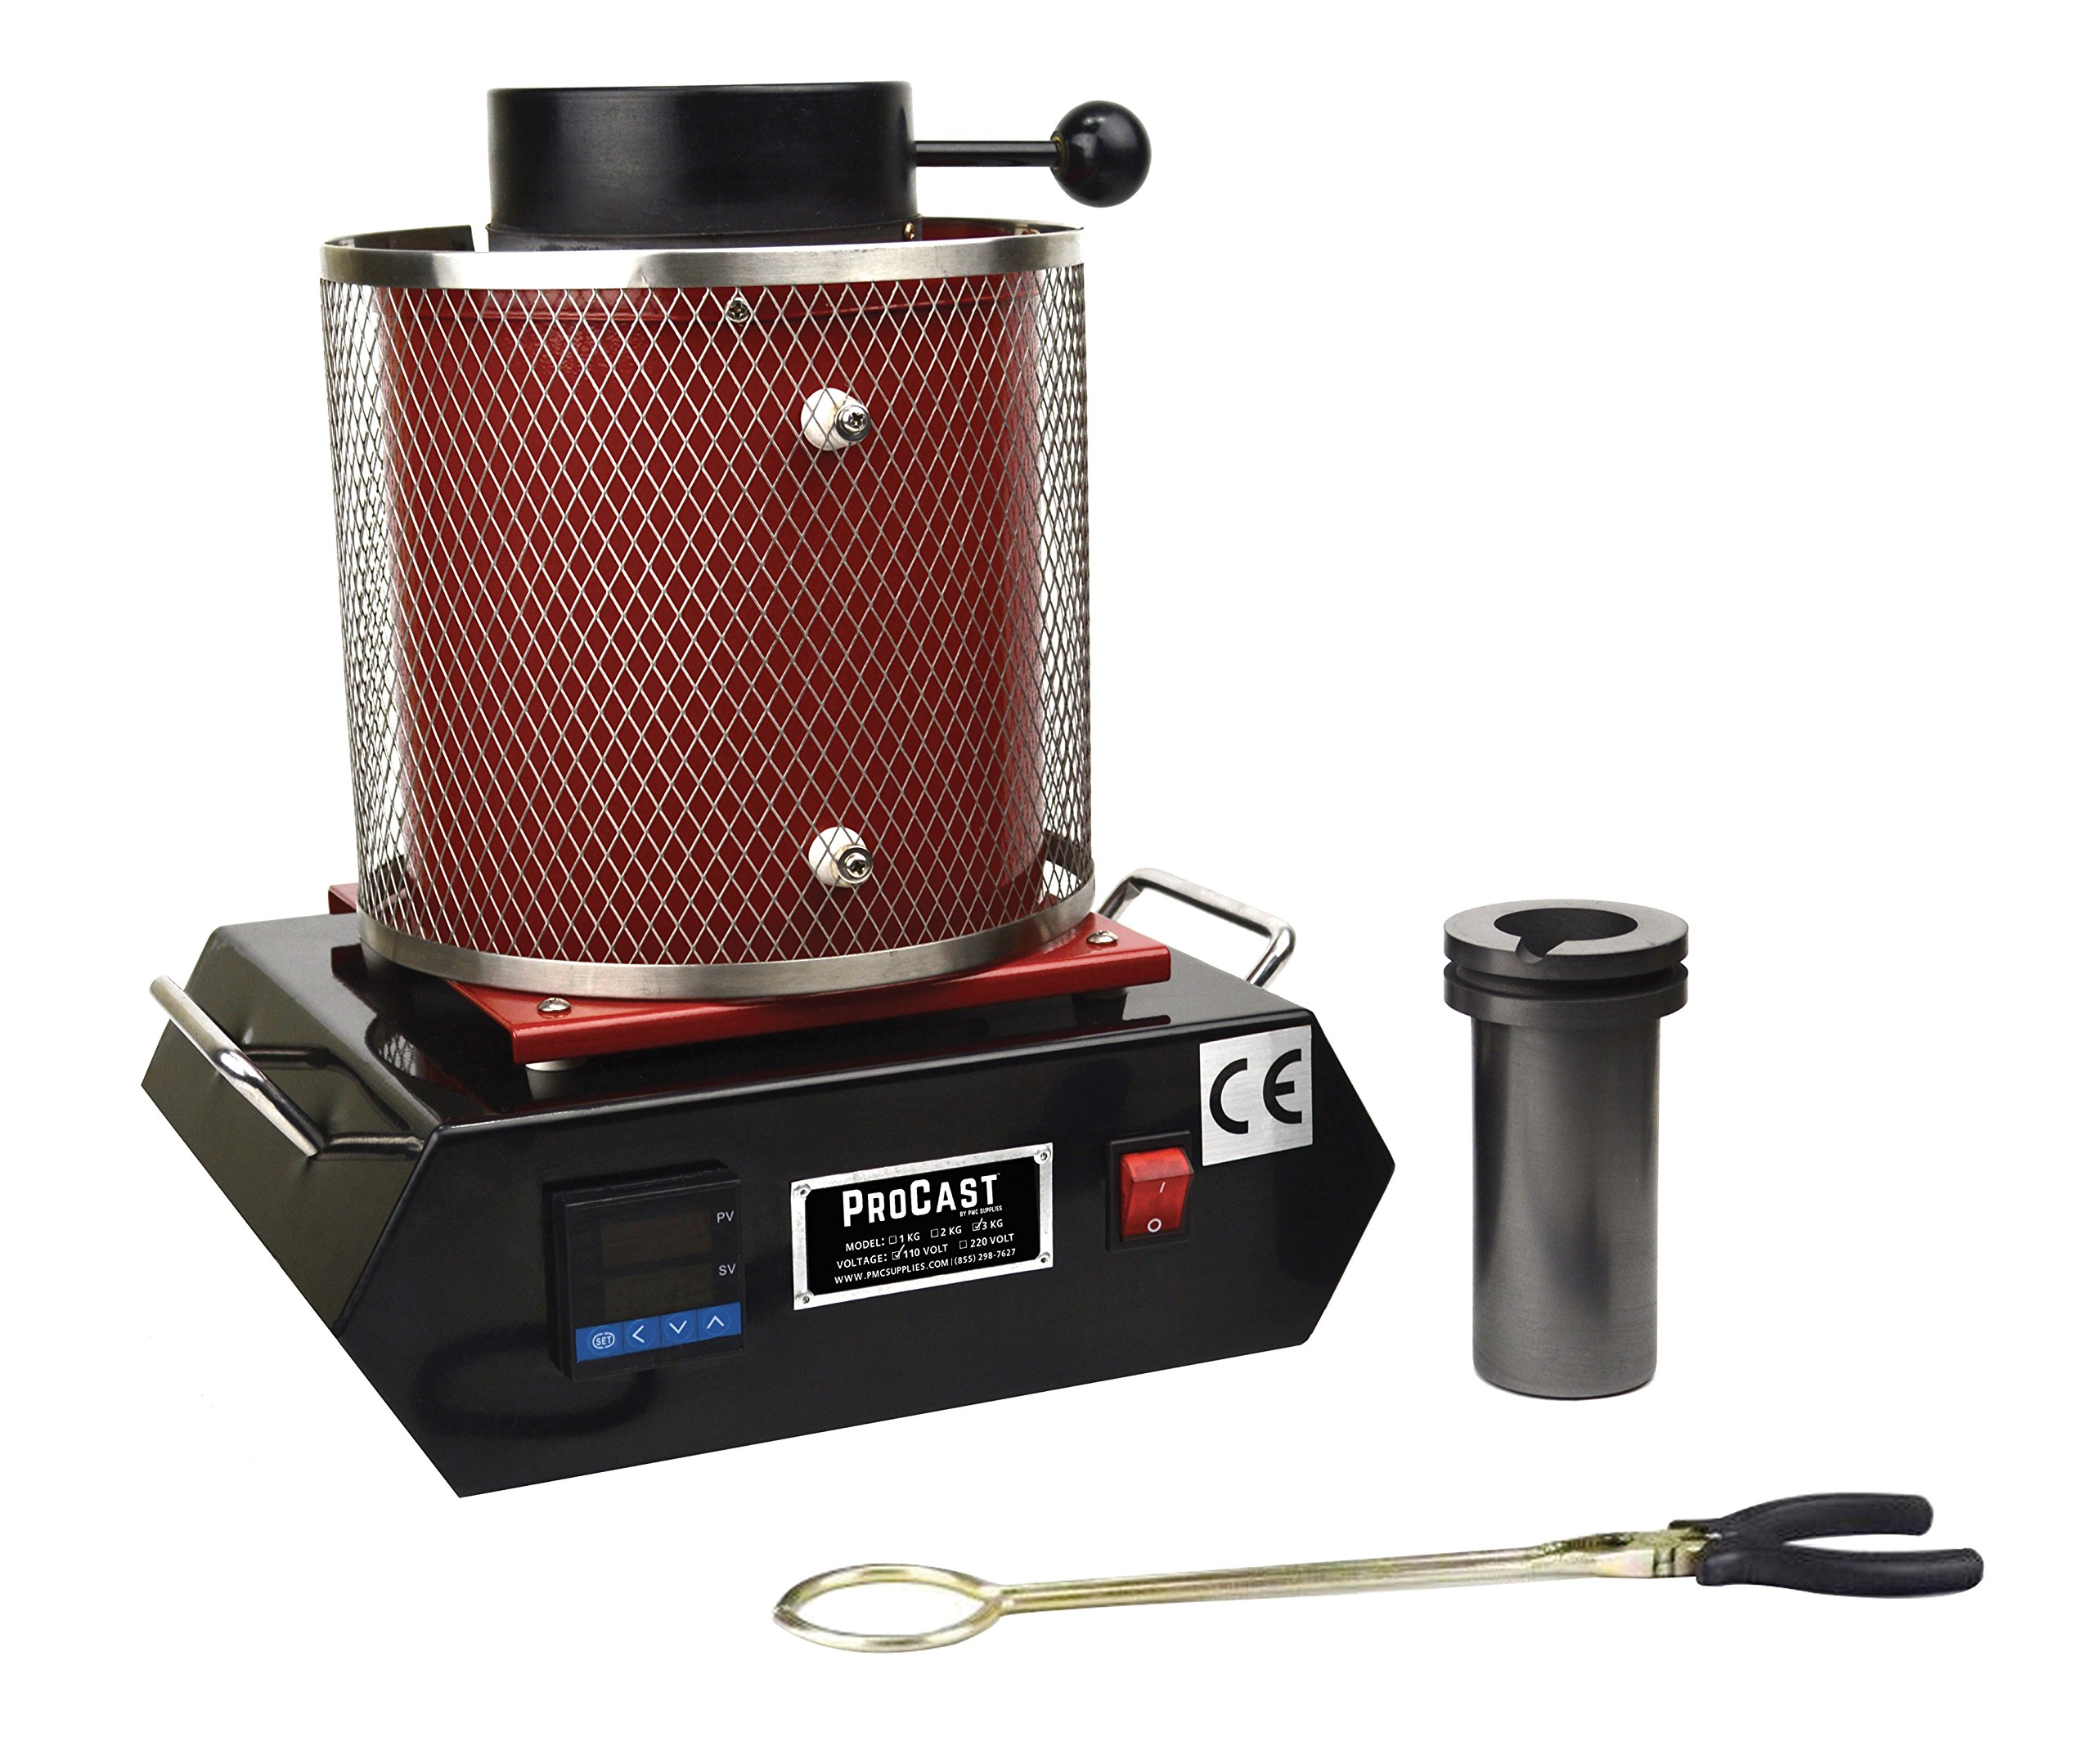 ProCast 3 KG Gold Melting Furnace Machine U.S. 110V Kiln Casting Refining Precious Metals Melts Gold Silver Tin Aluminum 2102°F